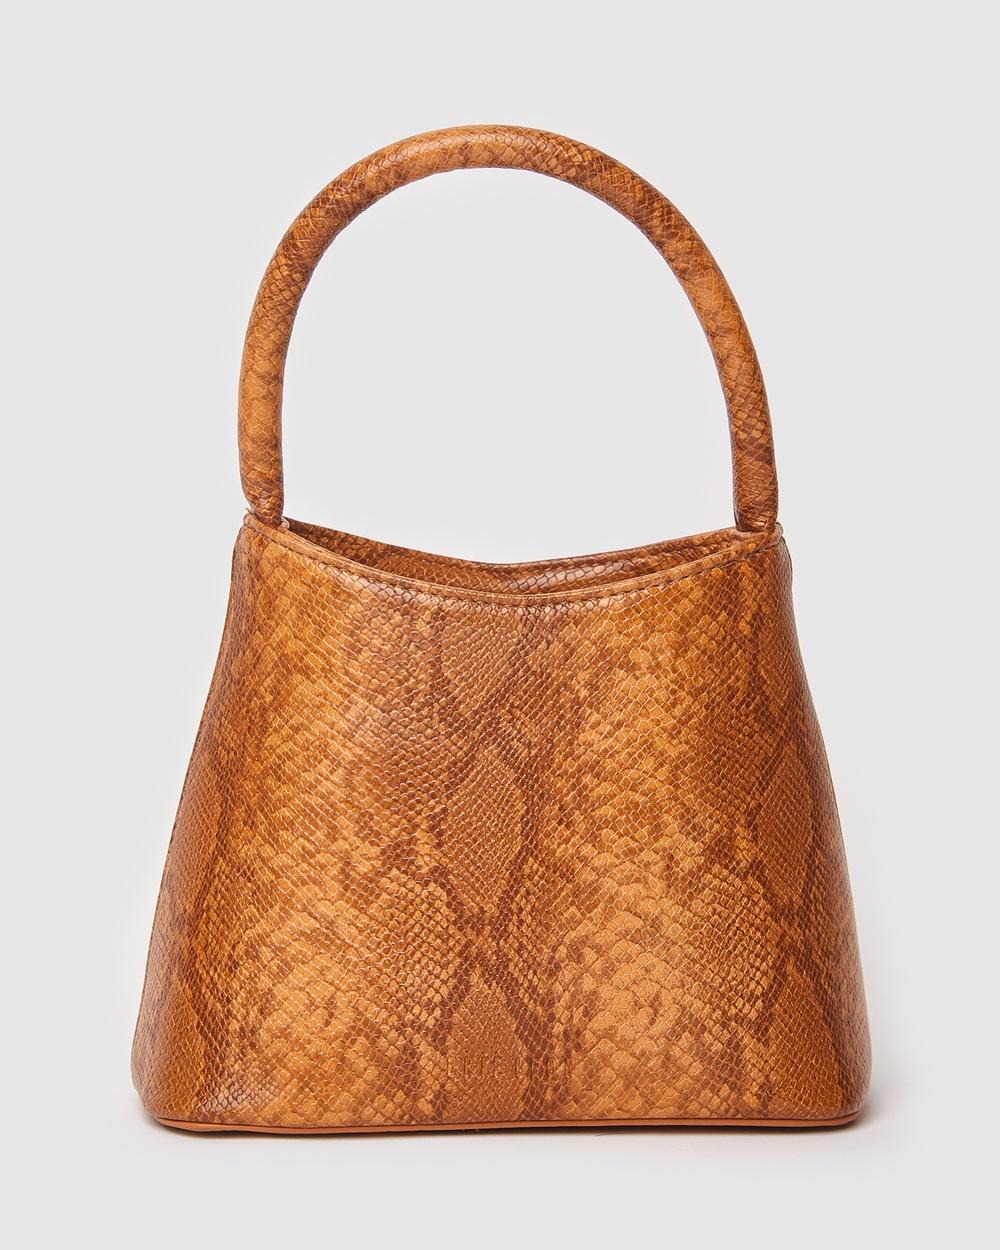 Brie Leon The Mini Chloe Bag Handbags Orange Australia